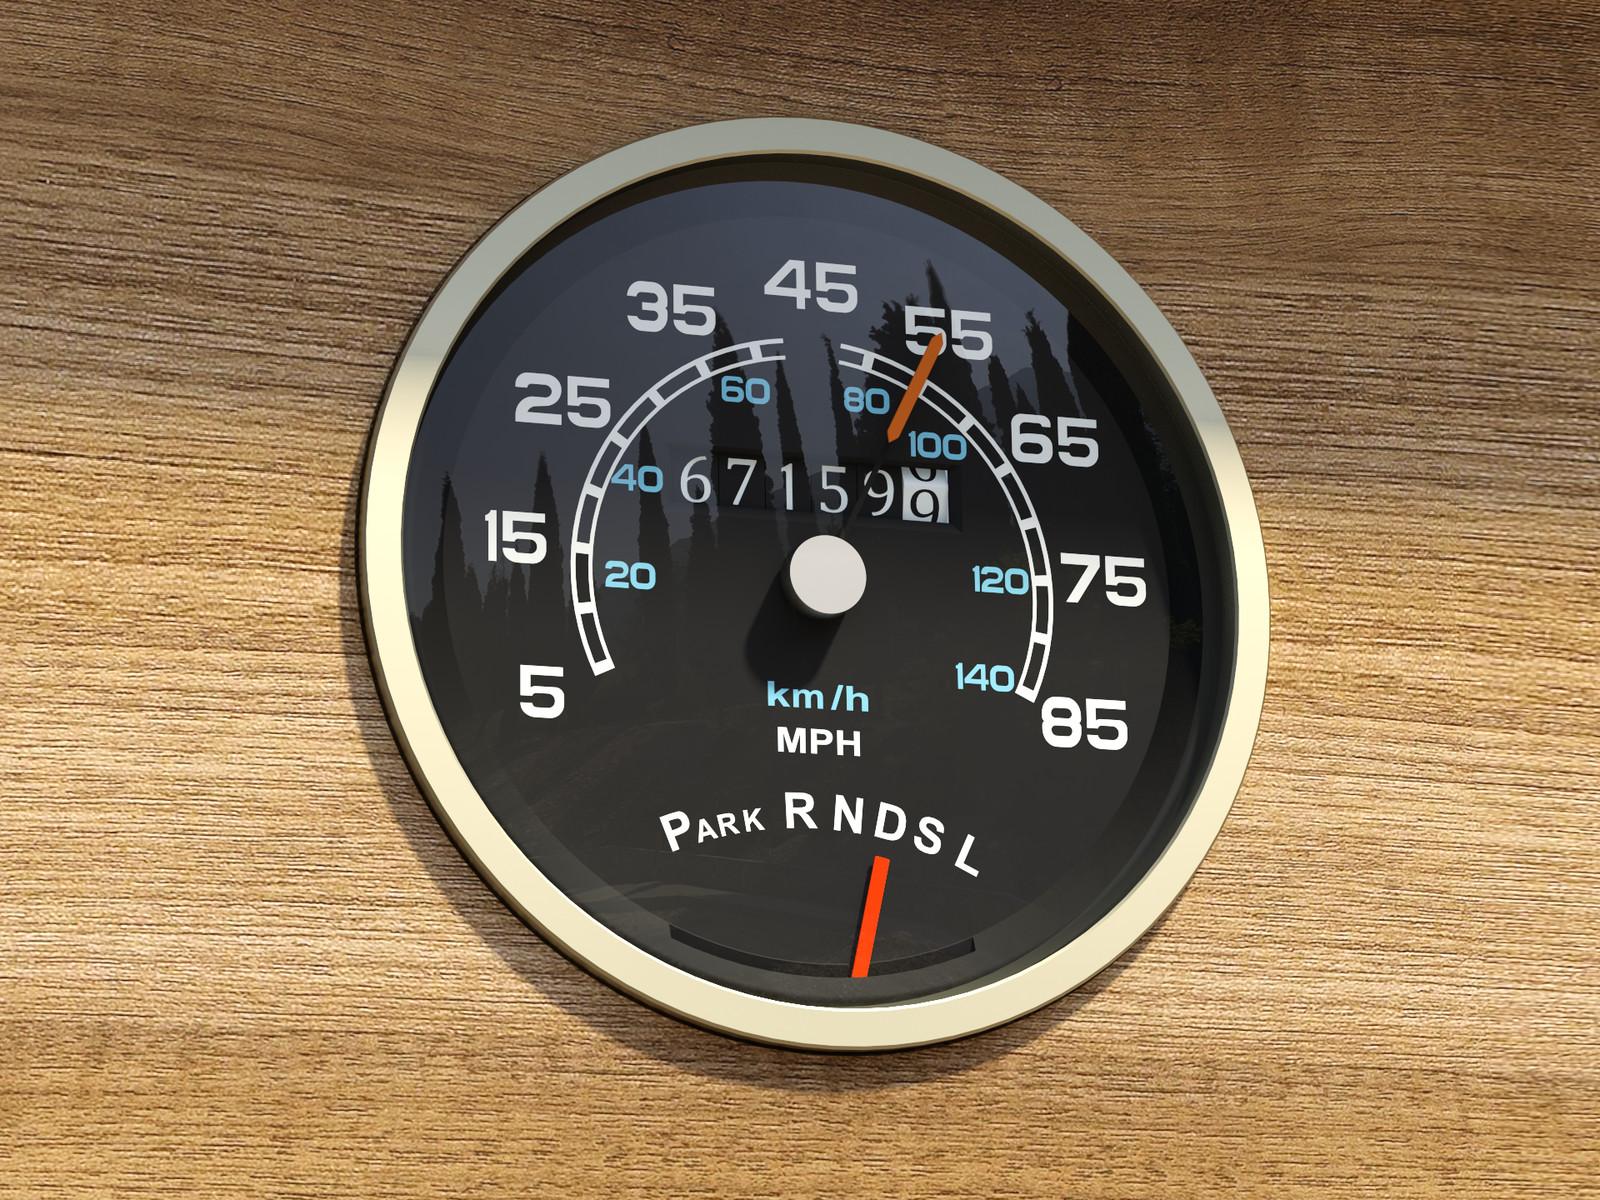 Built with SketchUp 2018, rendered with SketchUp + 2017 Thea Render V2 1977 GMC Motorhome speedometer V2017-Scene 4 Presto 8m9s 1024sp